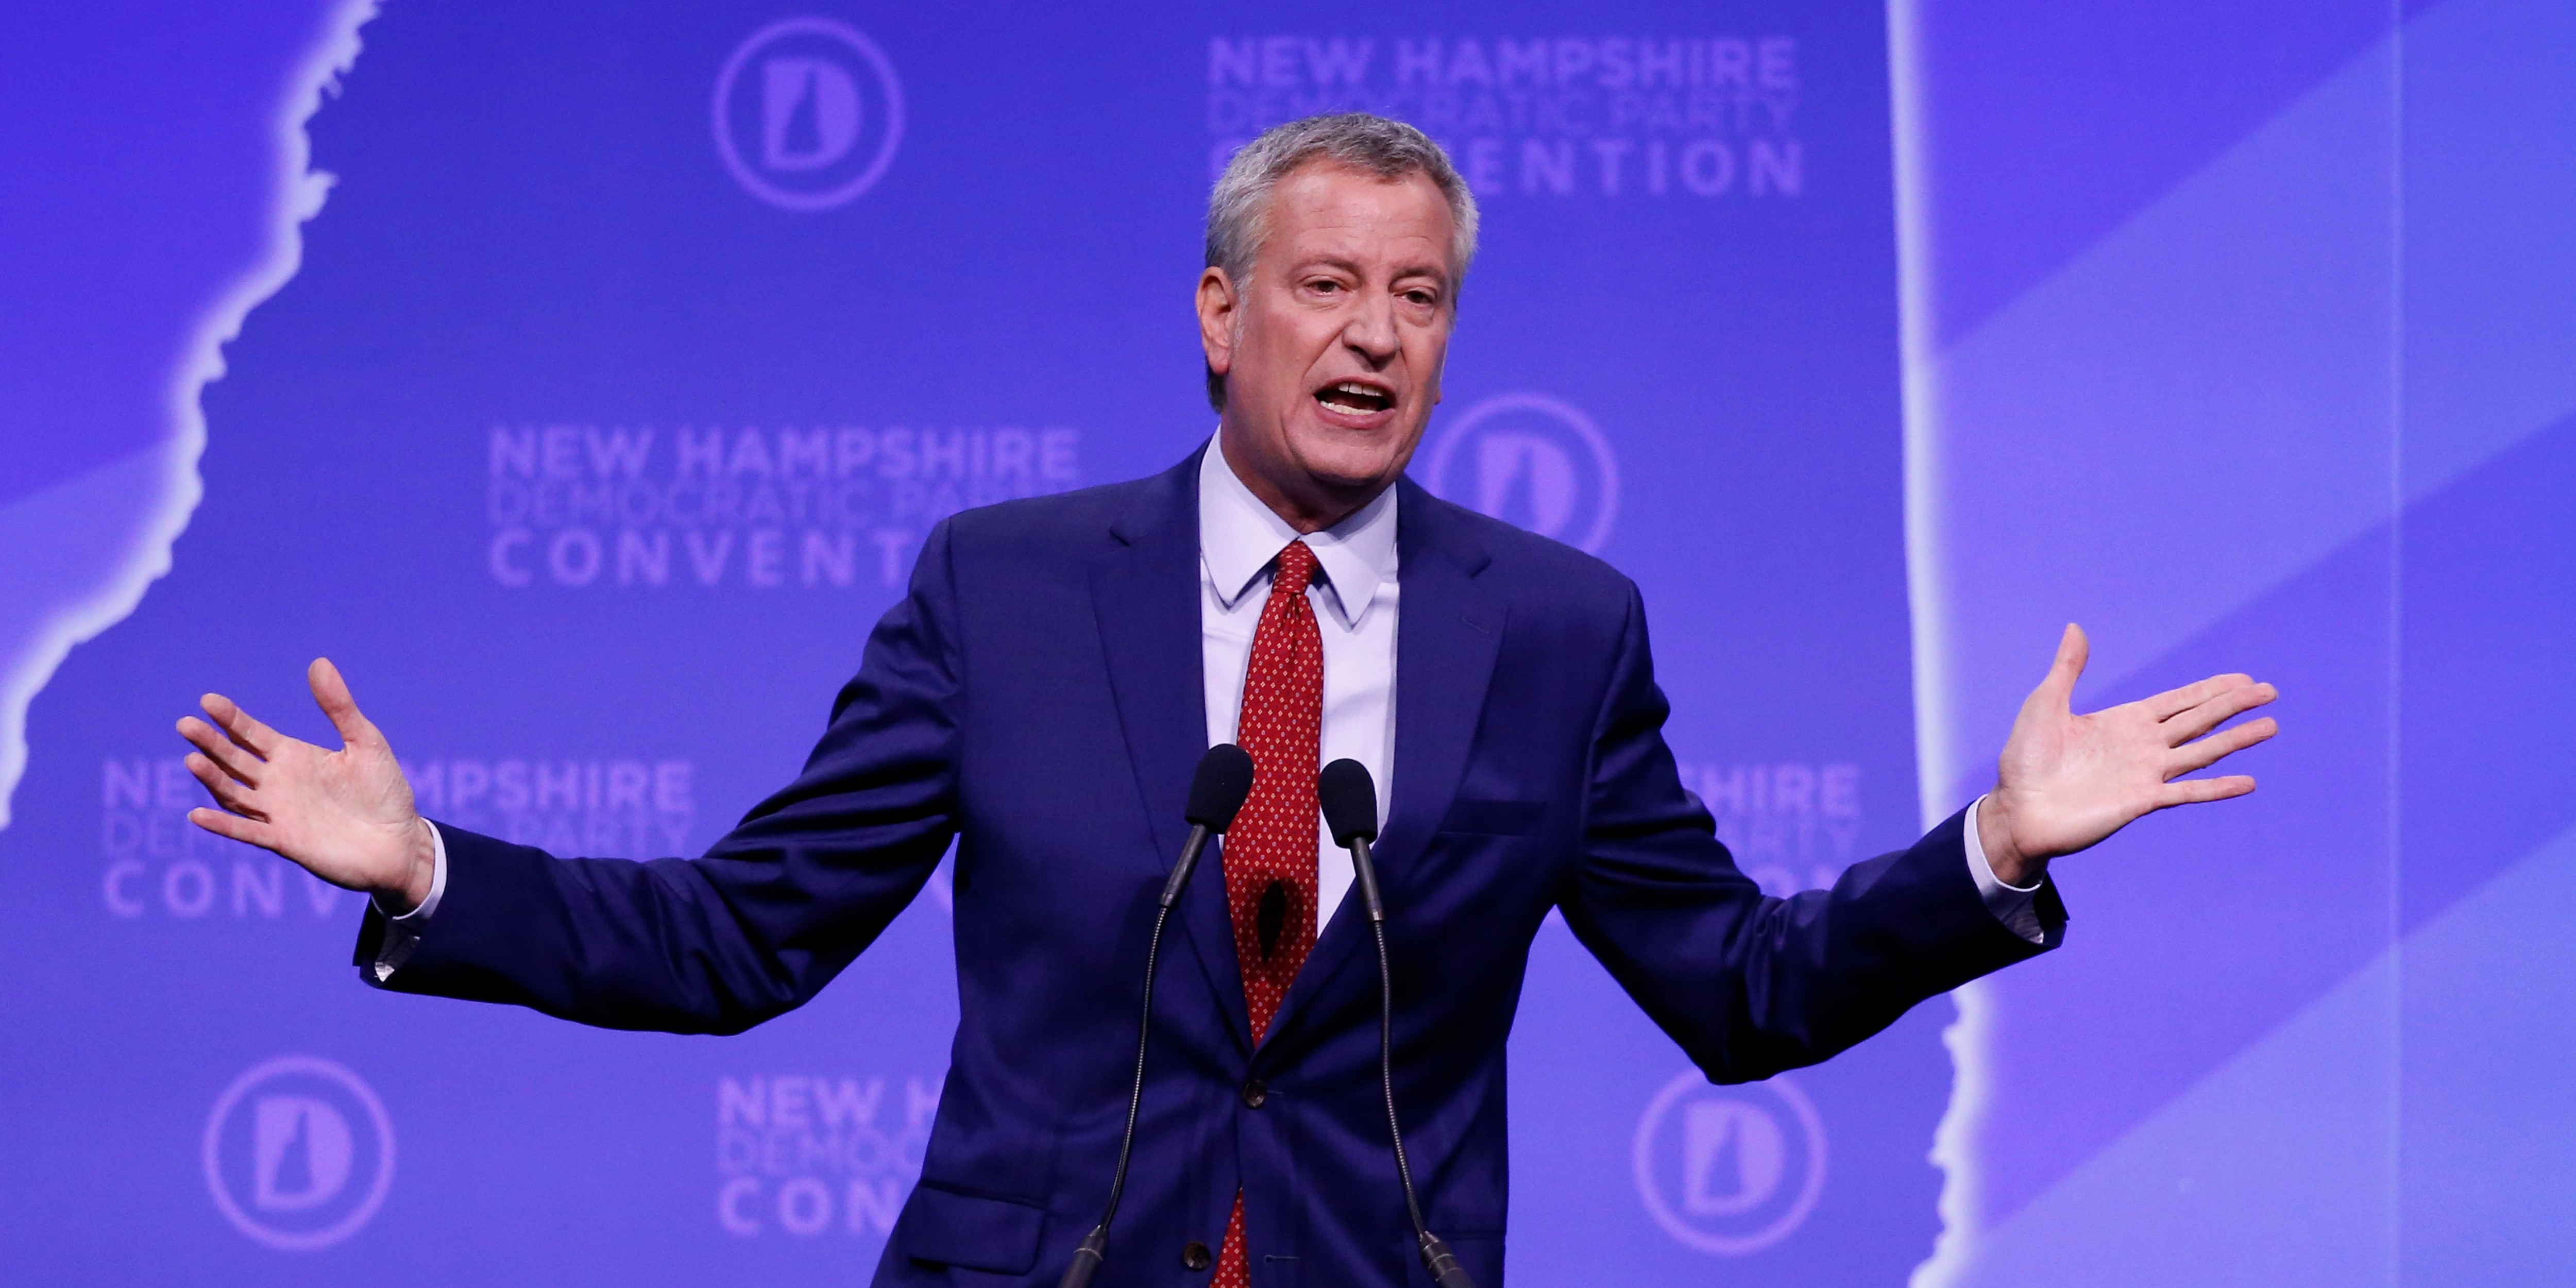 New York Mayor Bill de Blasio drops 2020 presidential bid